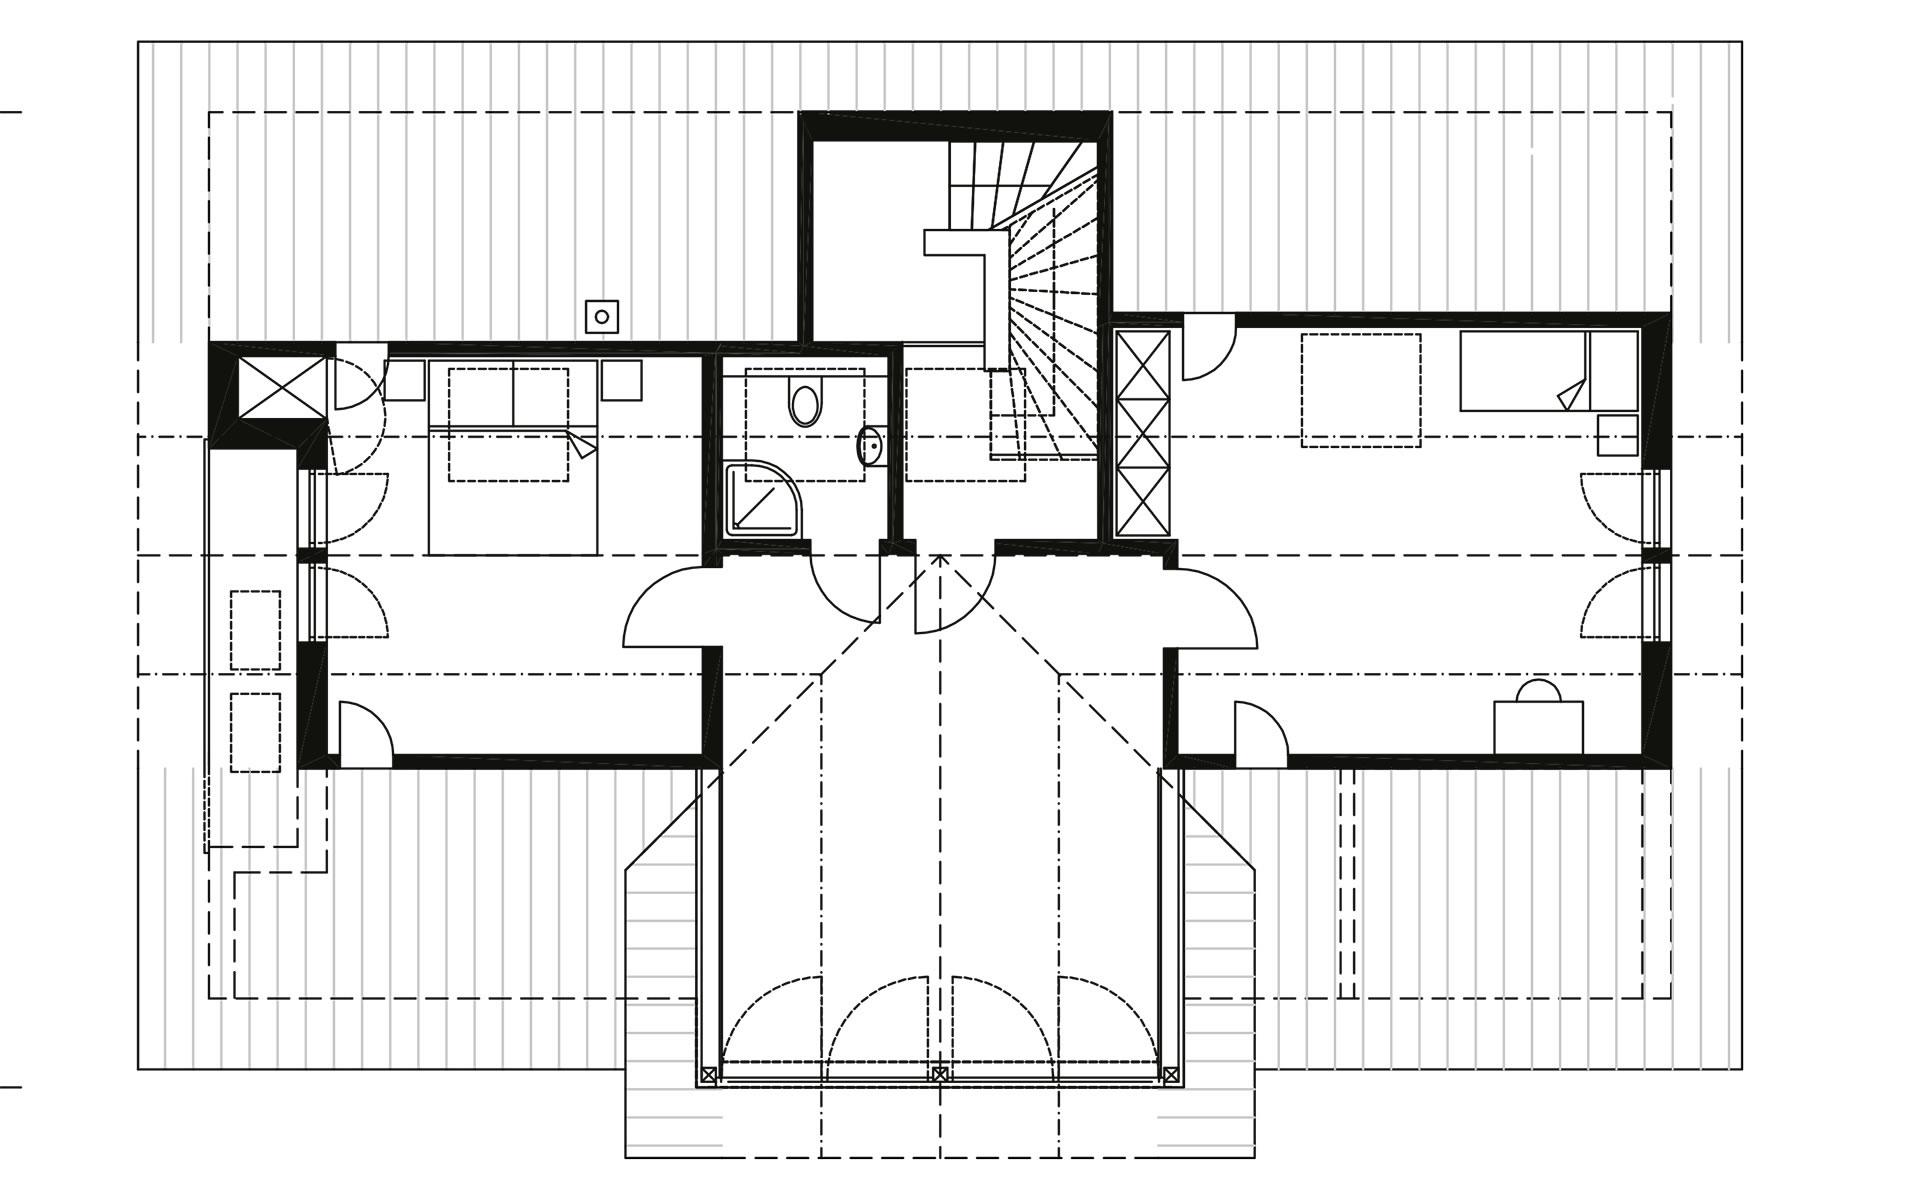 Dachgeschoss Gruber von Sonnleitner Holzbauwerke GmbH & Co. KG